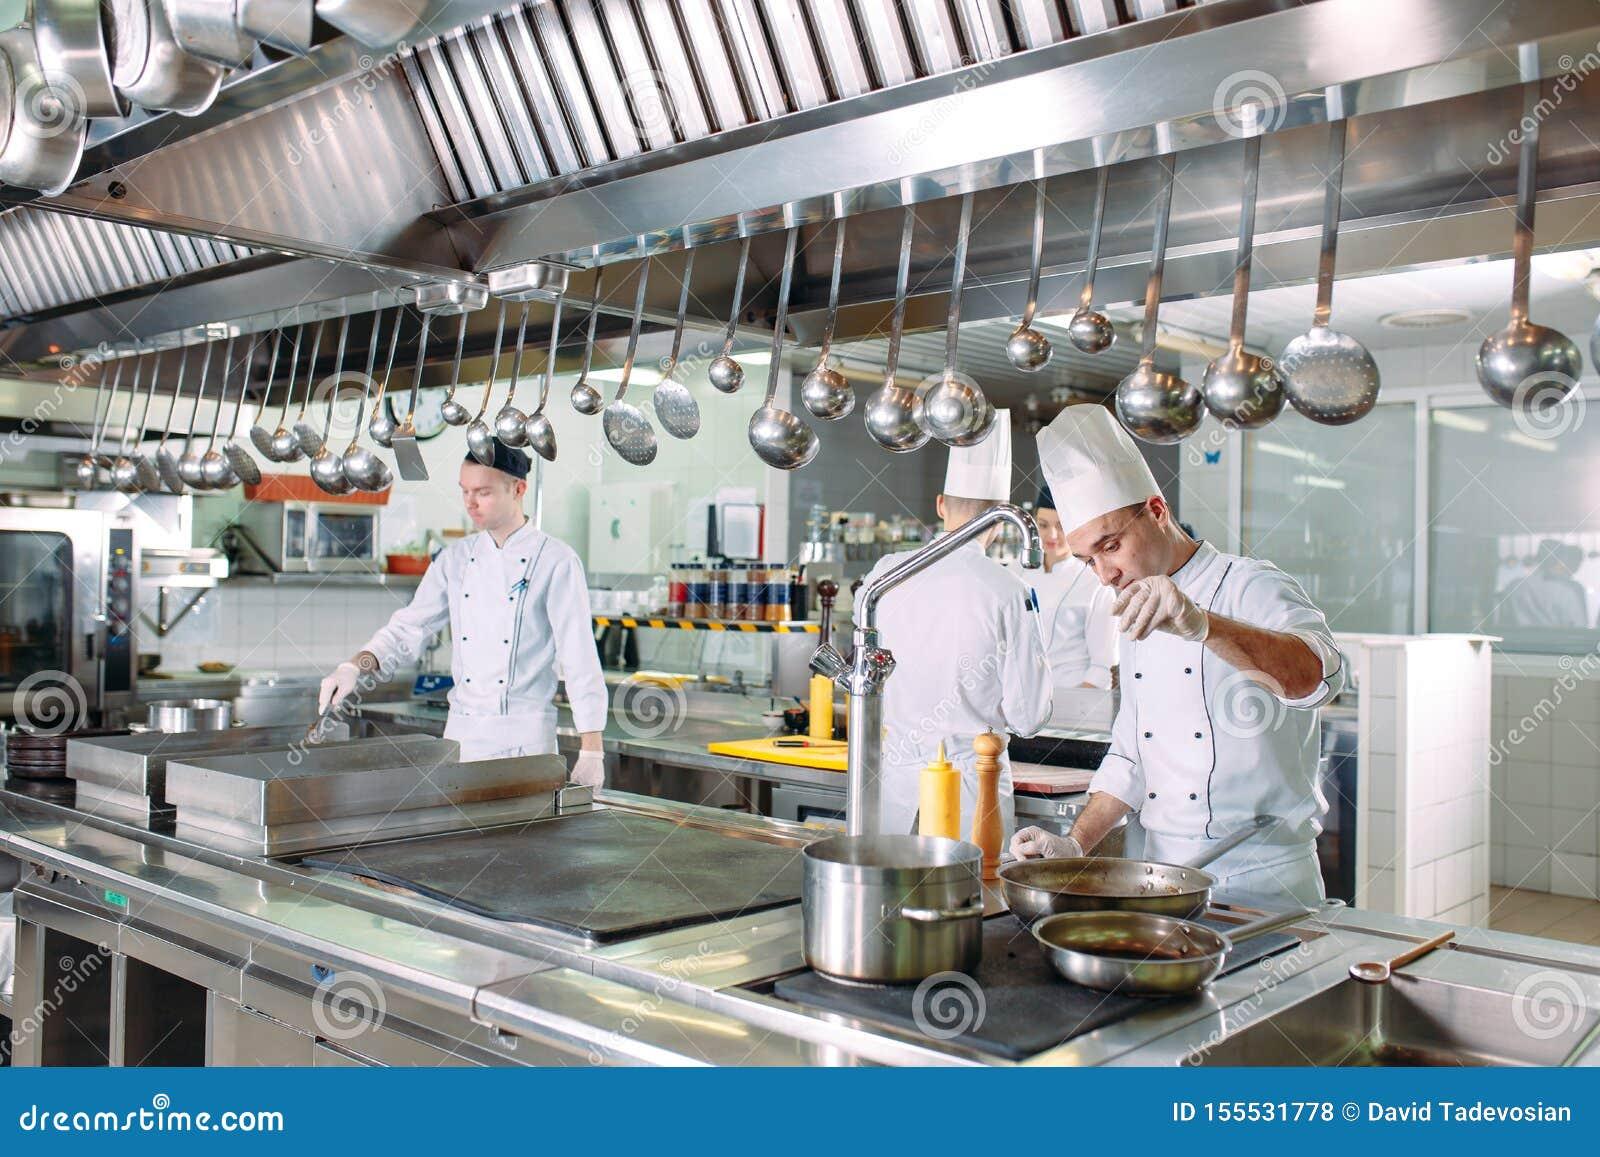 Modern Kitchen The Chefs Prepare Meals In The Restaurant S Kitchen Stock Photo Image Of Preparation Lifestyle 155531778